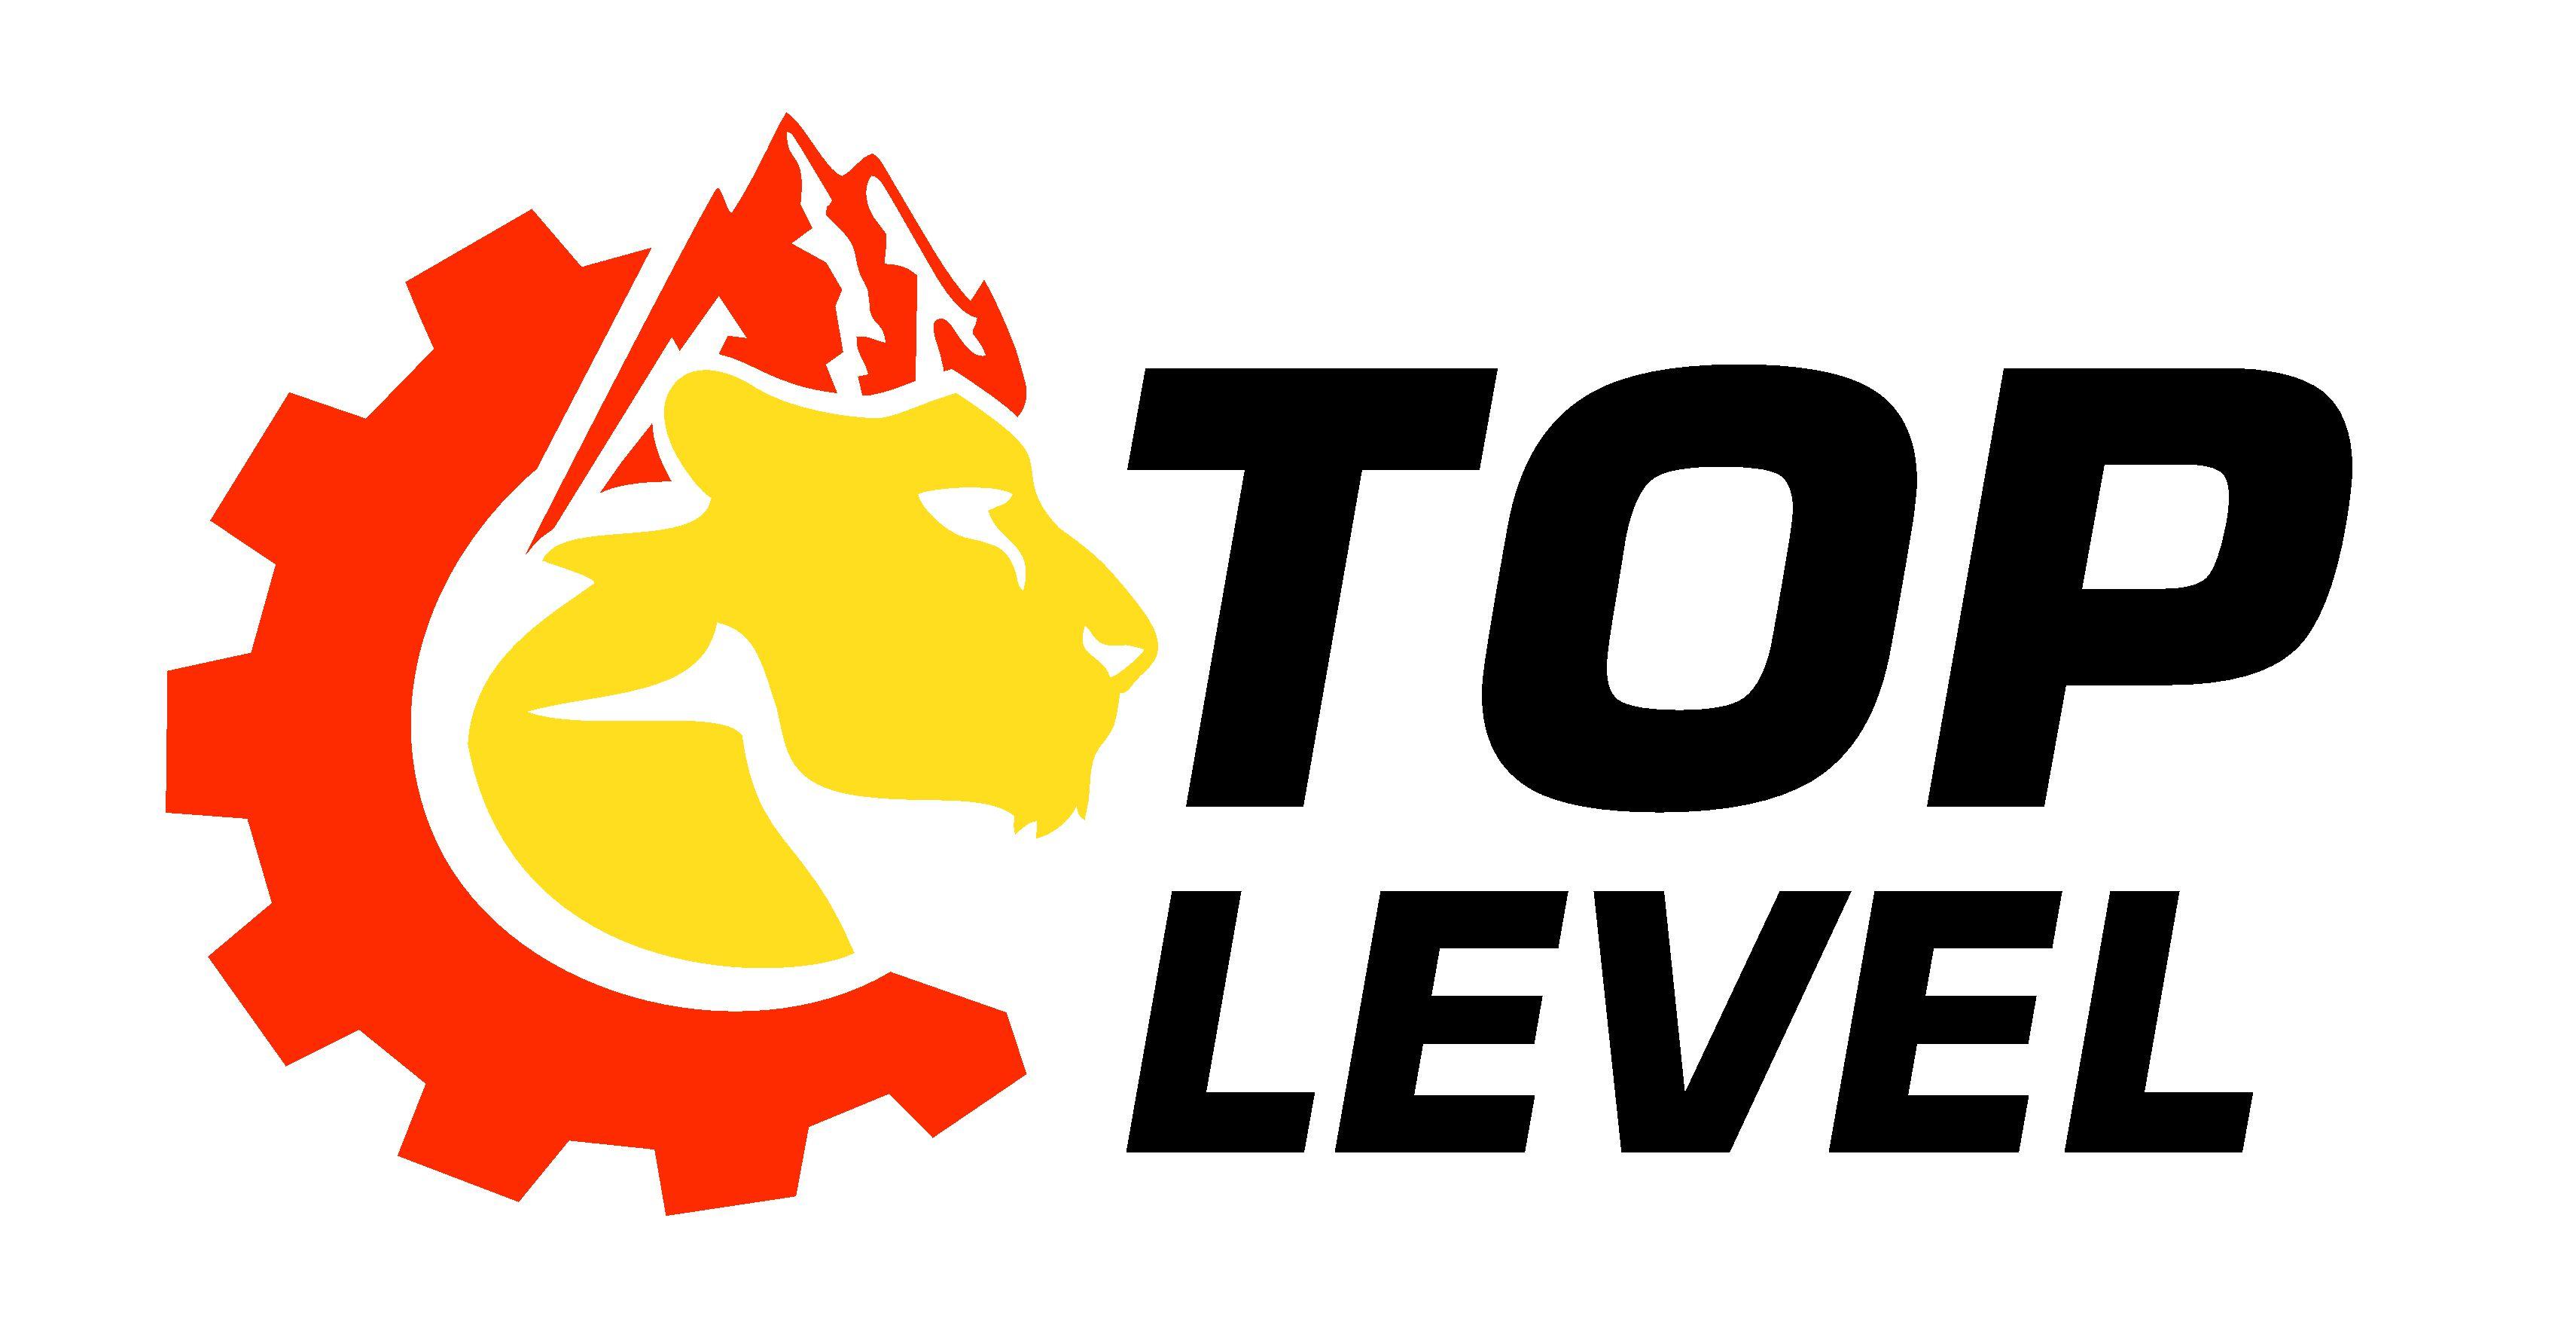 Разработка логотипа для тюнинг ателье фото f_5755f36eef2c0dd4.jpg